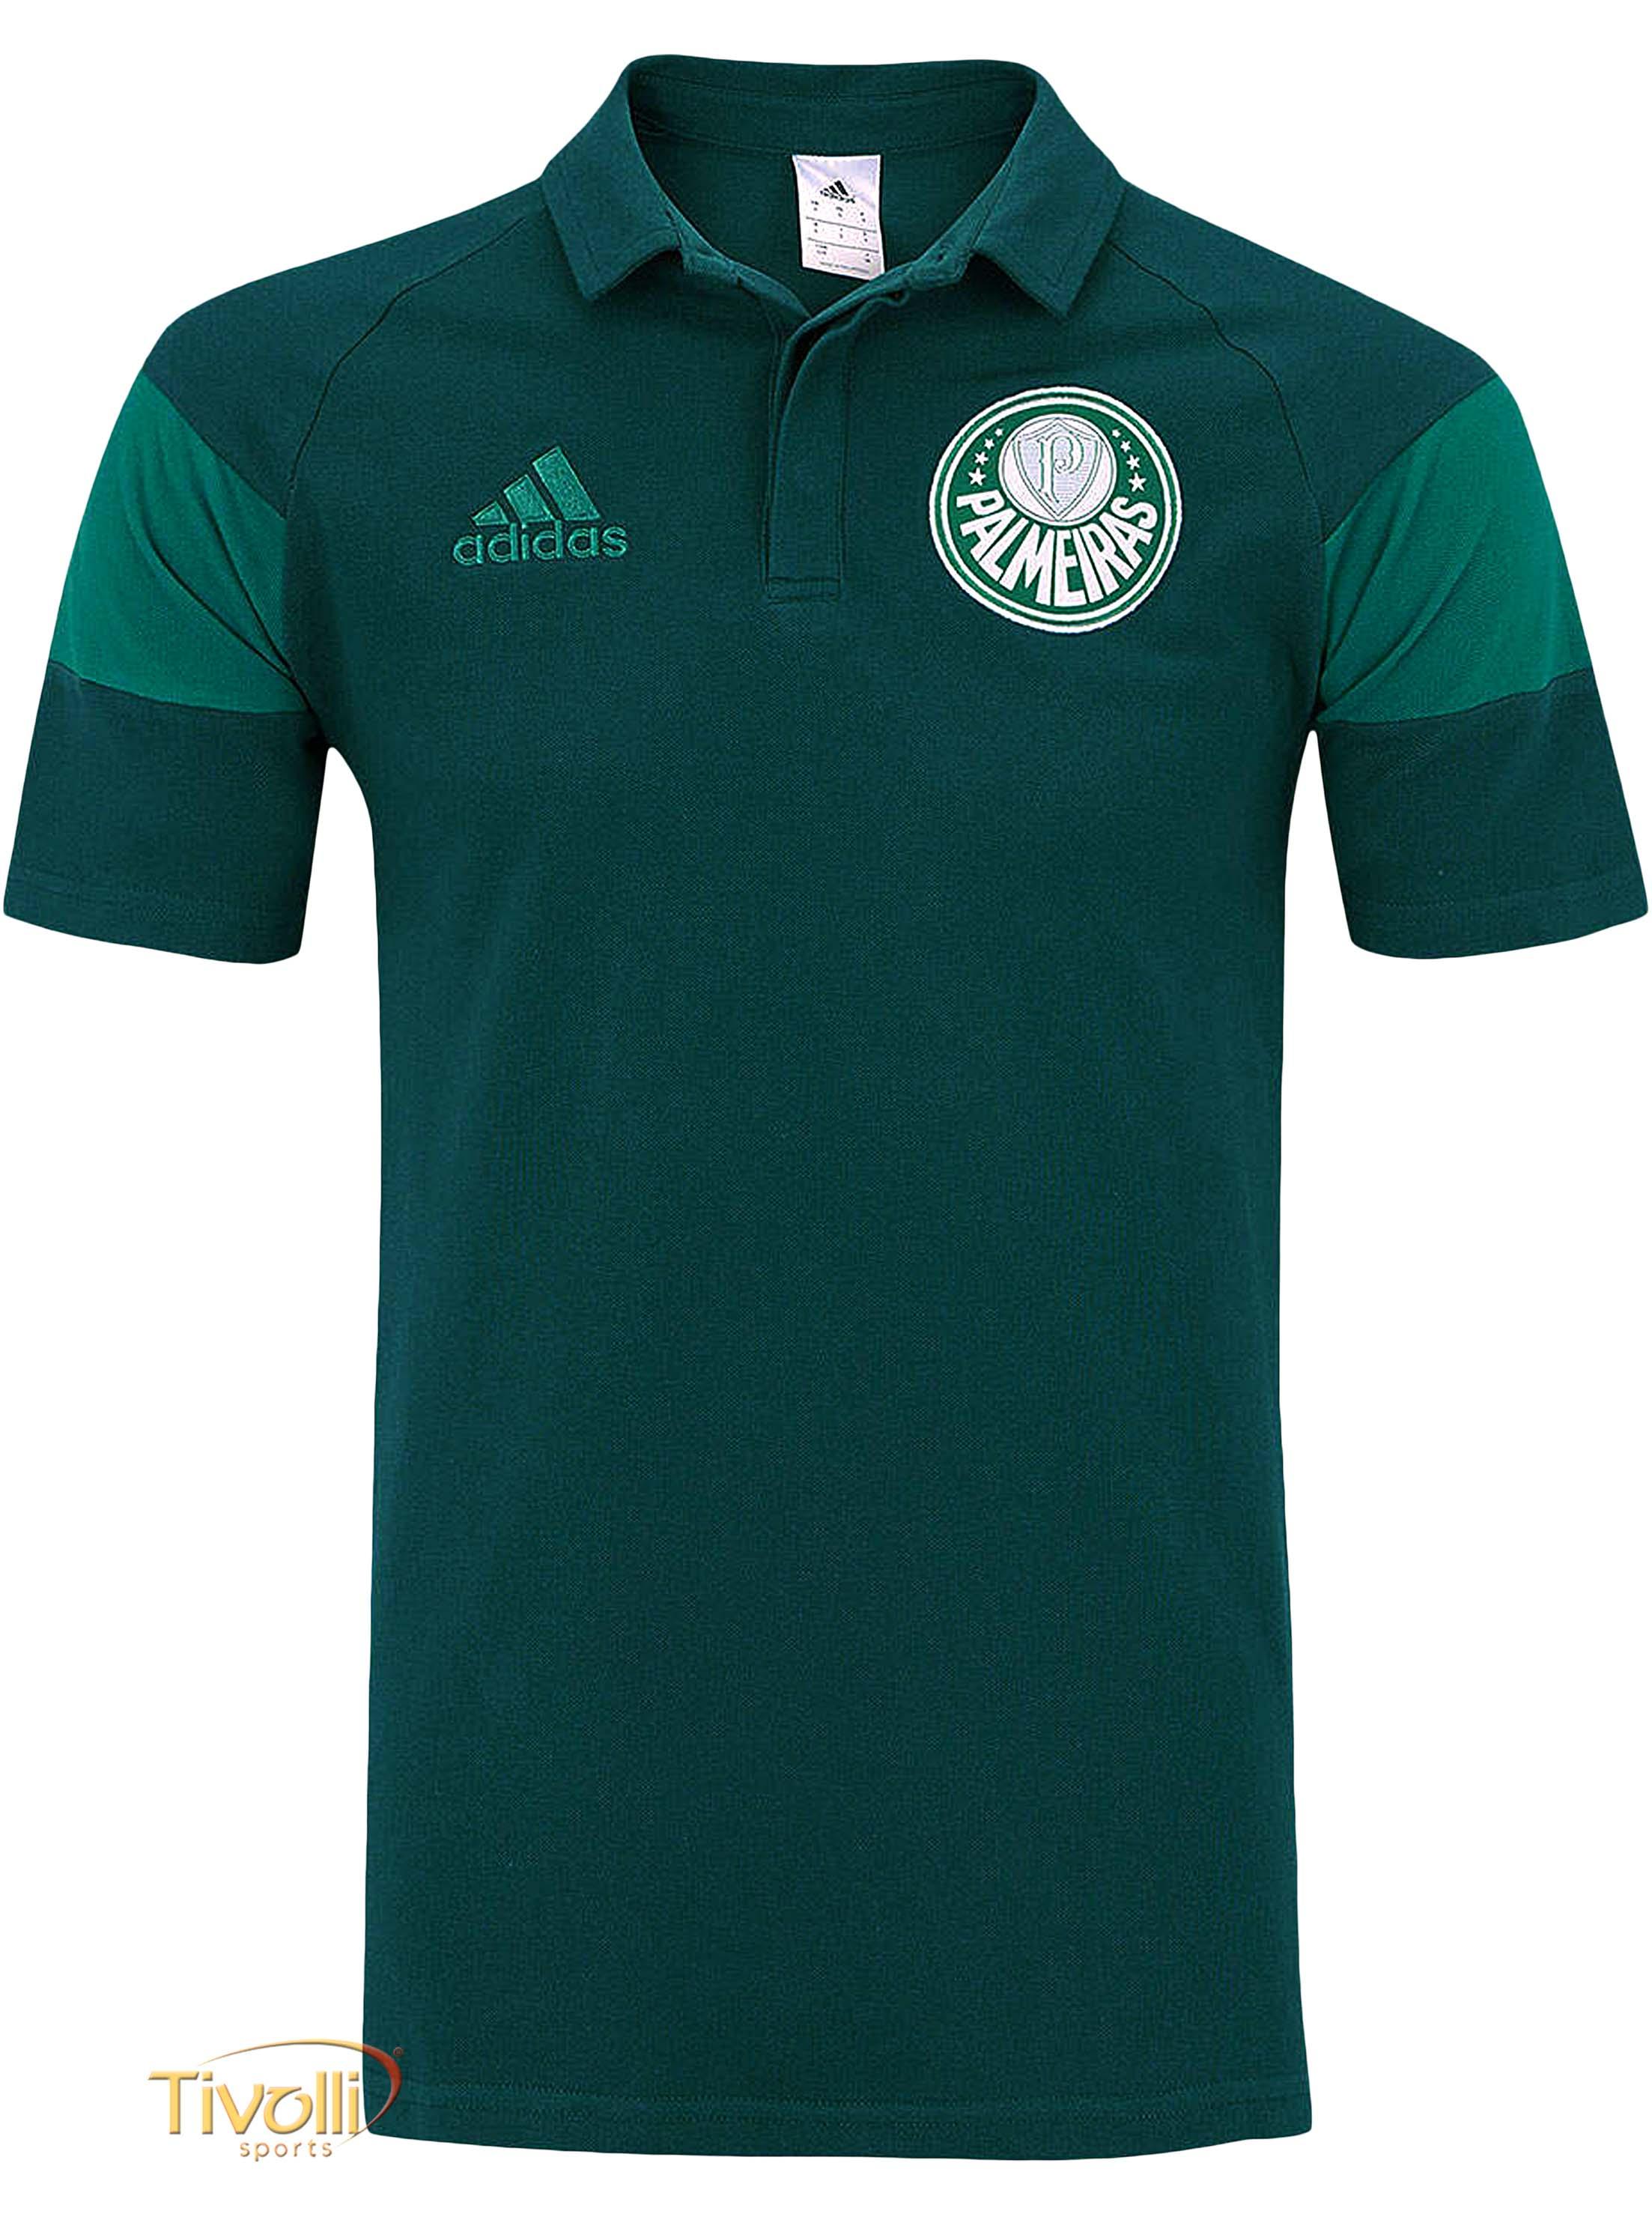 272e3d7c74 Camisa Polo Palmeiras Adidas   verde